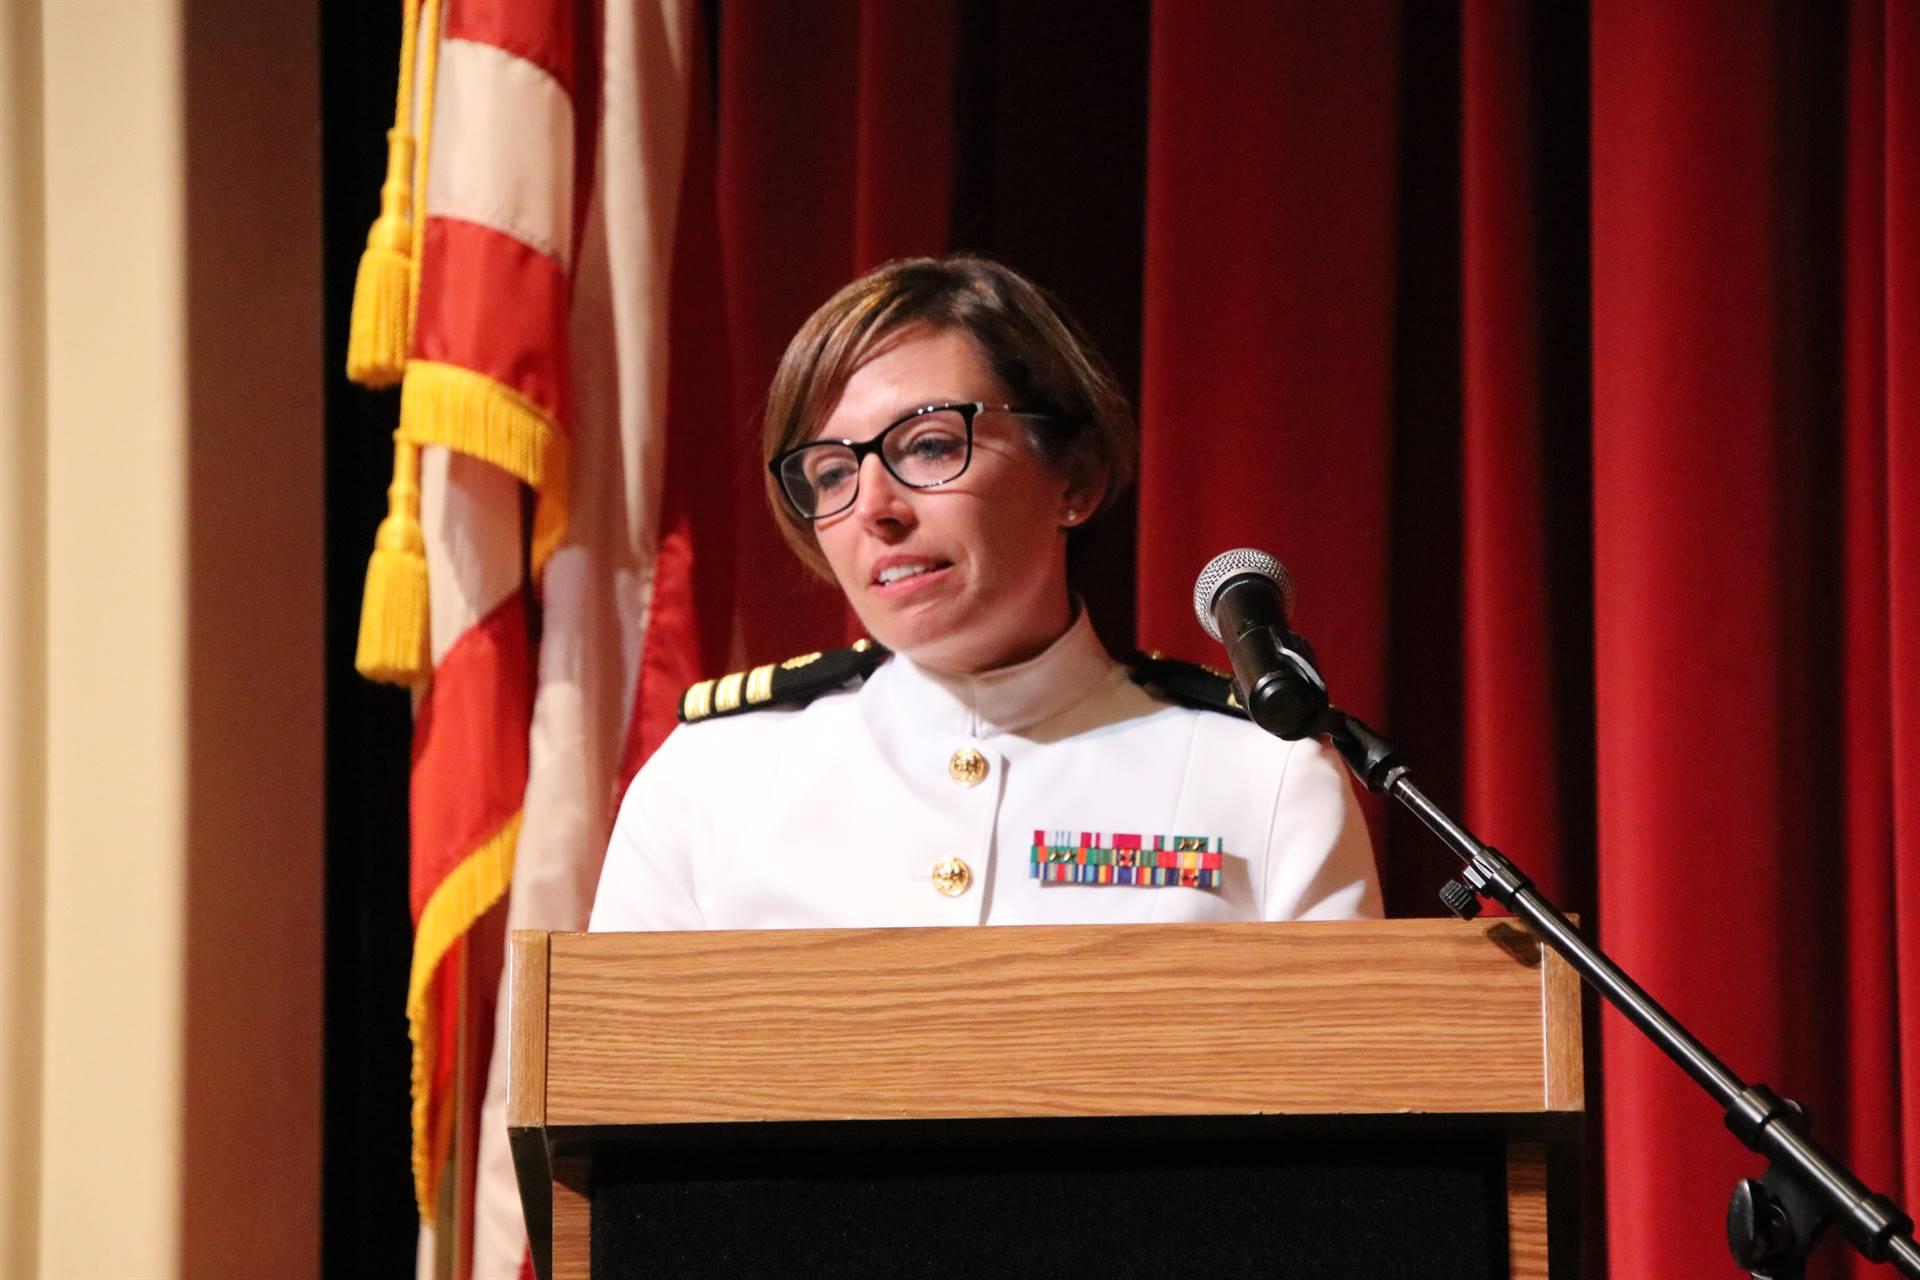 Hall of Distinction honoree - Commander Shattuck